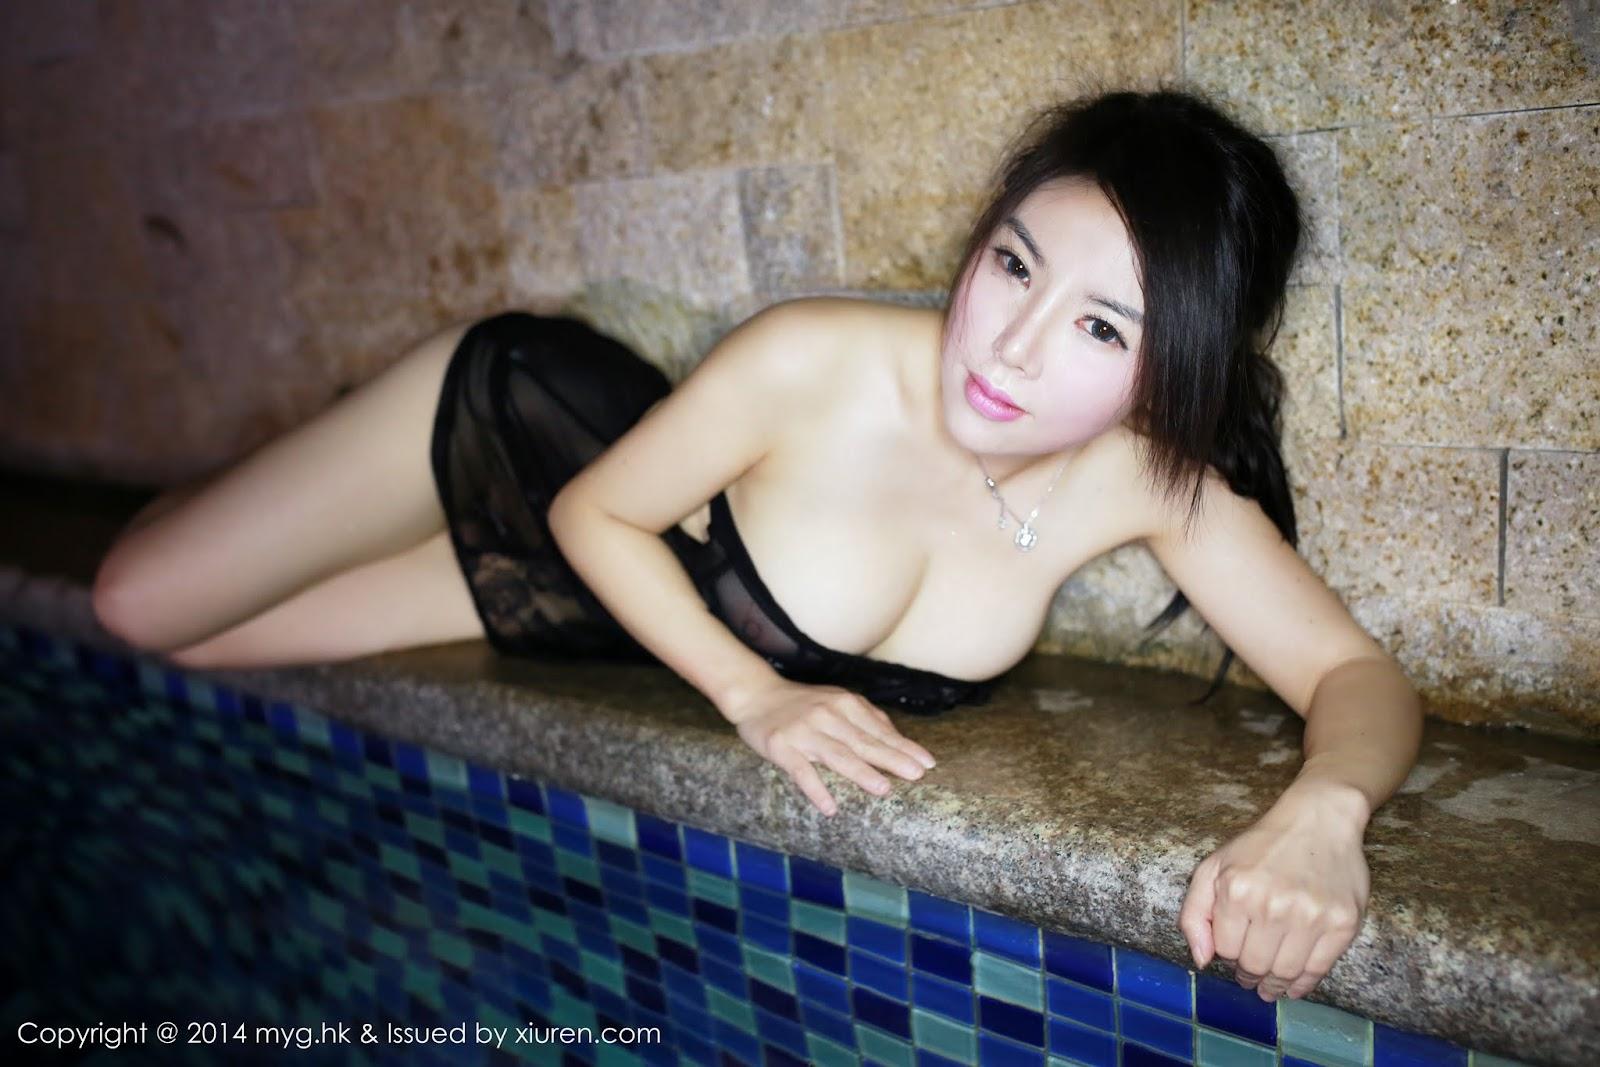 30067 076 - MYGIRL VOL.30 Photo Nude Hot Sexy